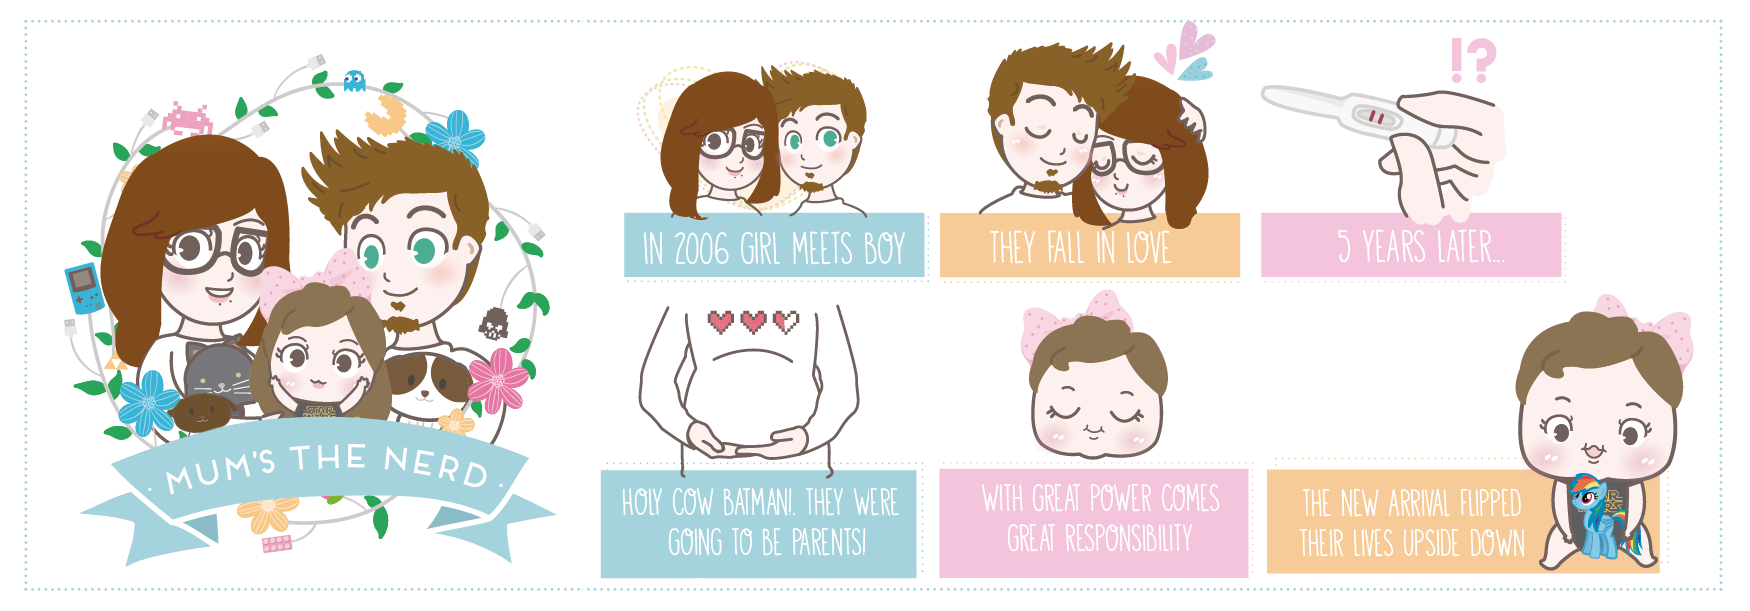 Mum's The Nerd -